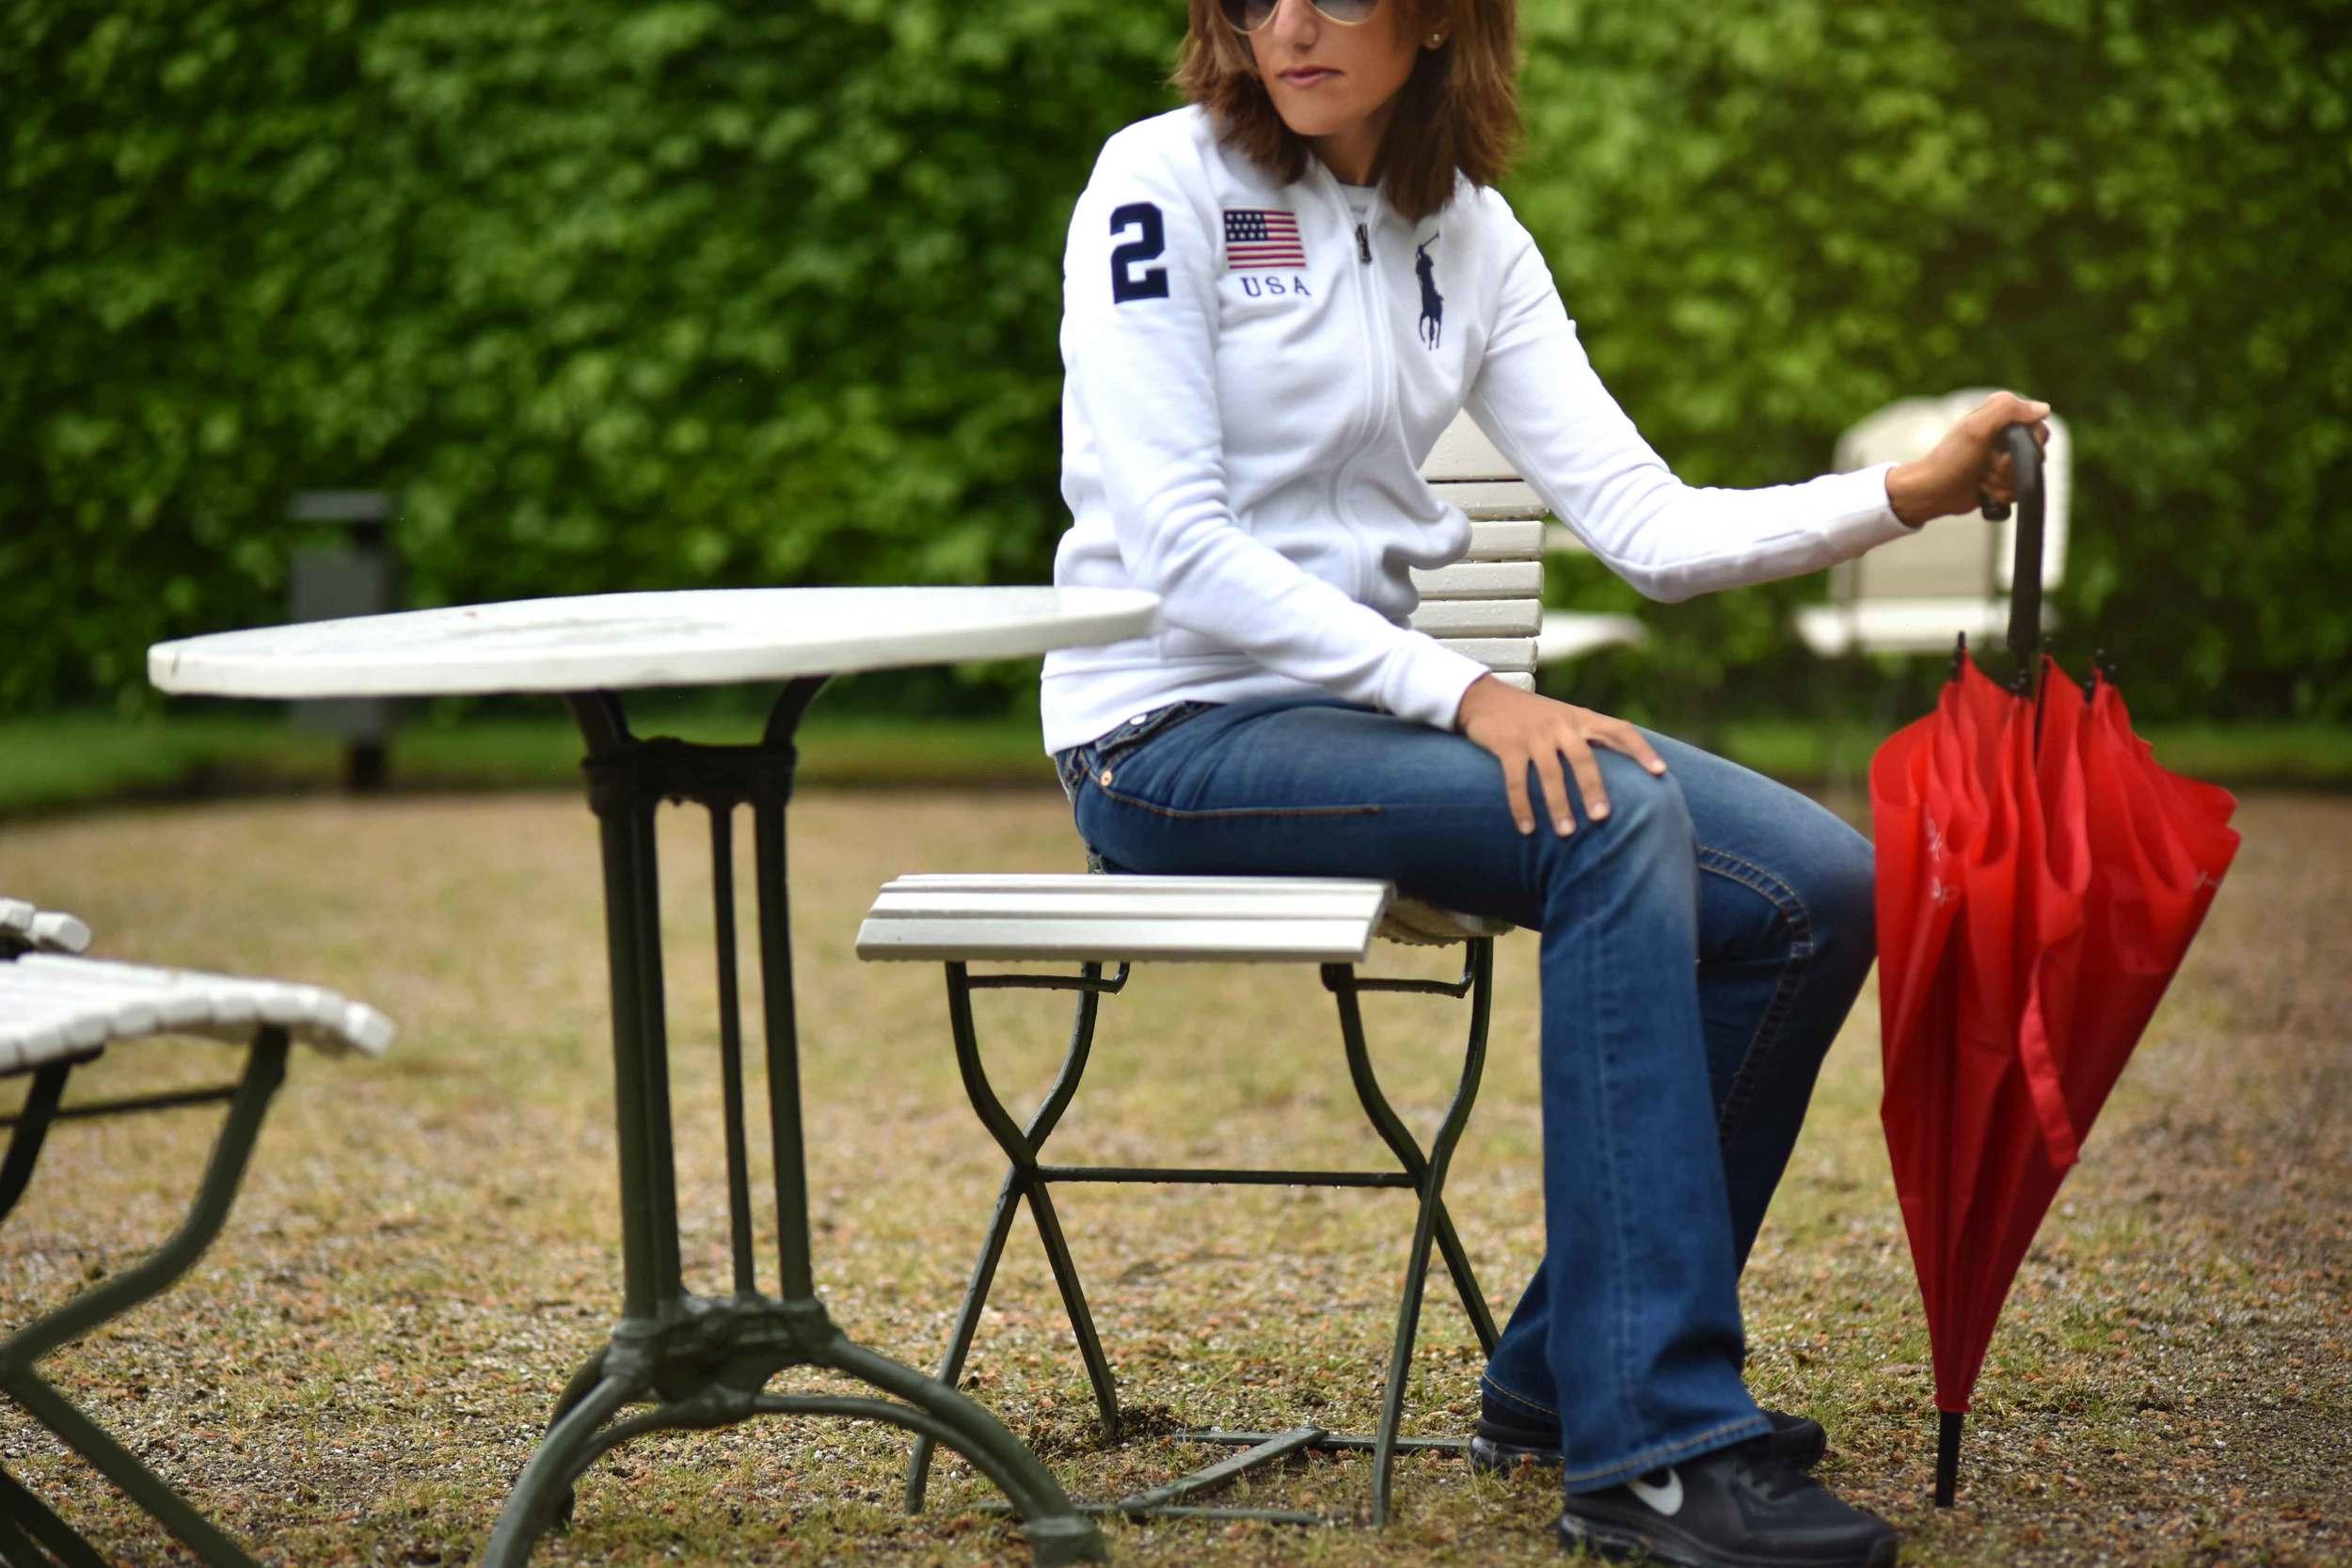 White Ralph Lauren Polo jacket, True Religion jeans, Nike sneakers, Gönneranlage, historic park, Baden Baden, Germany. Image©sourcingstyle.com